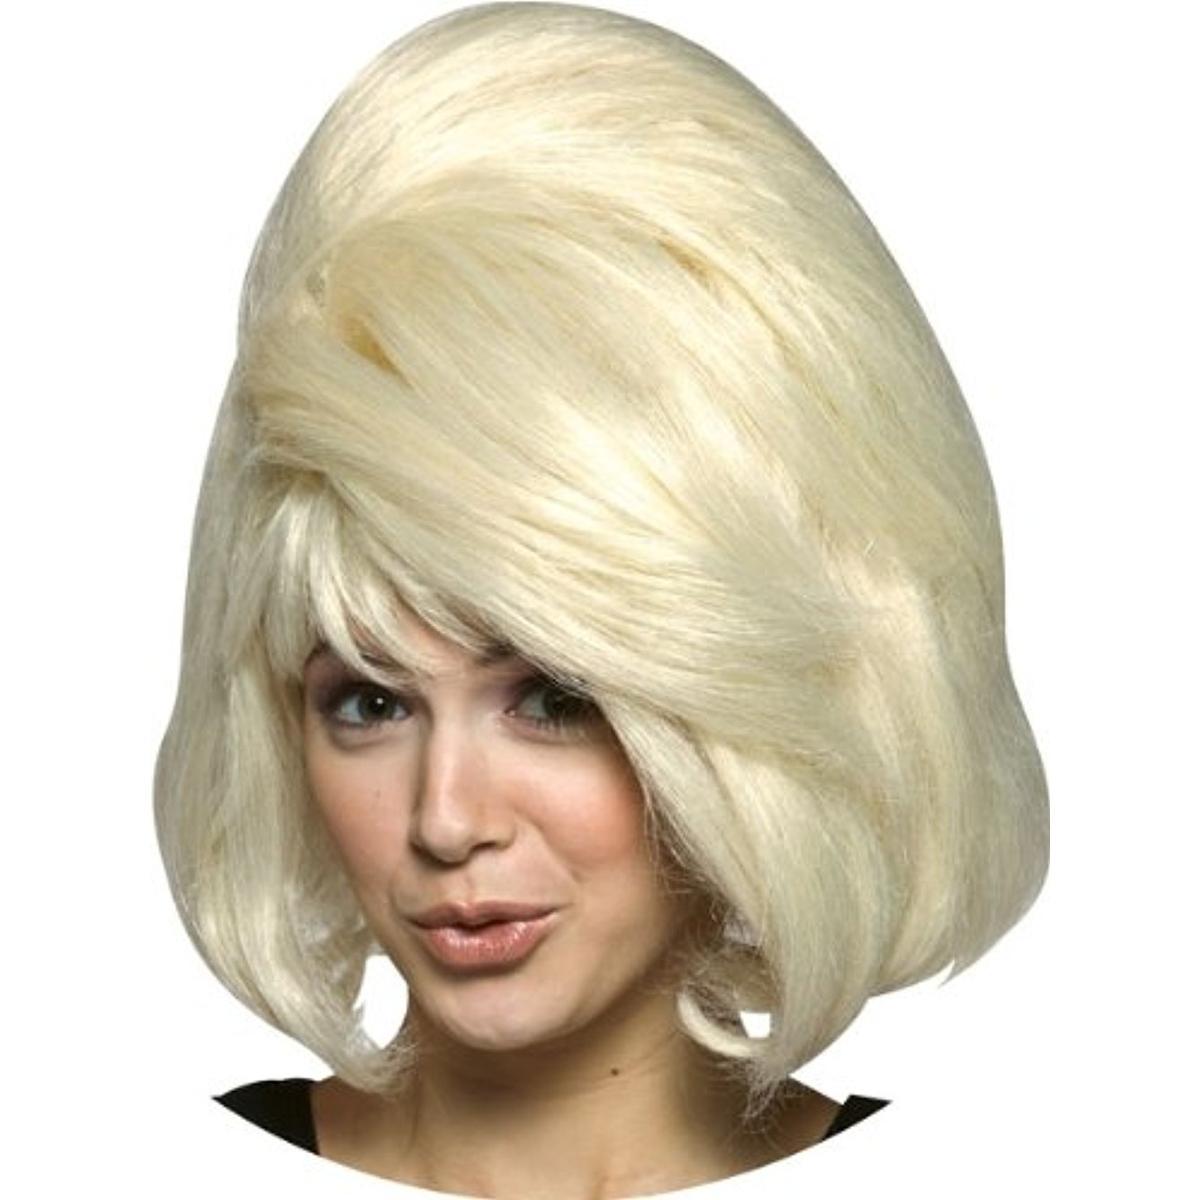 Rasta Imposta Womens Wig A La Mod Ivory Halloween Costume Wig O//S BHFO 4406